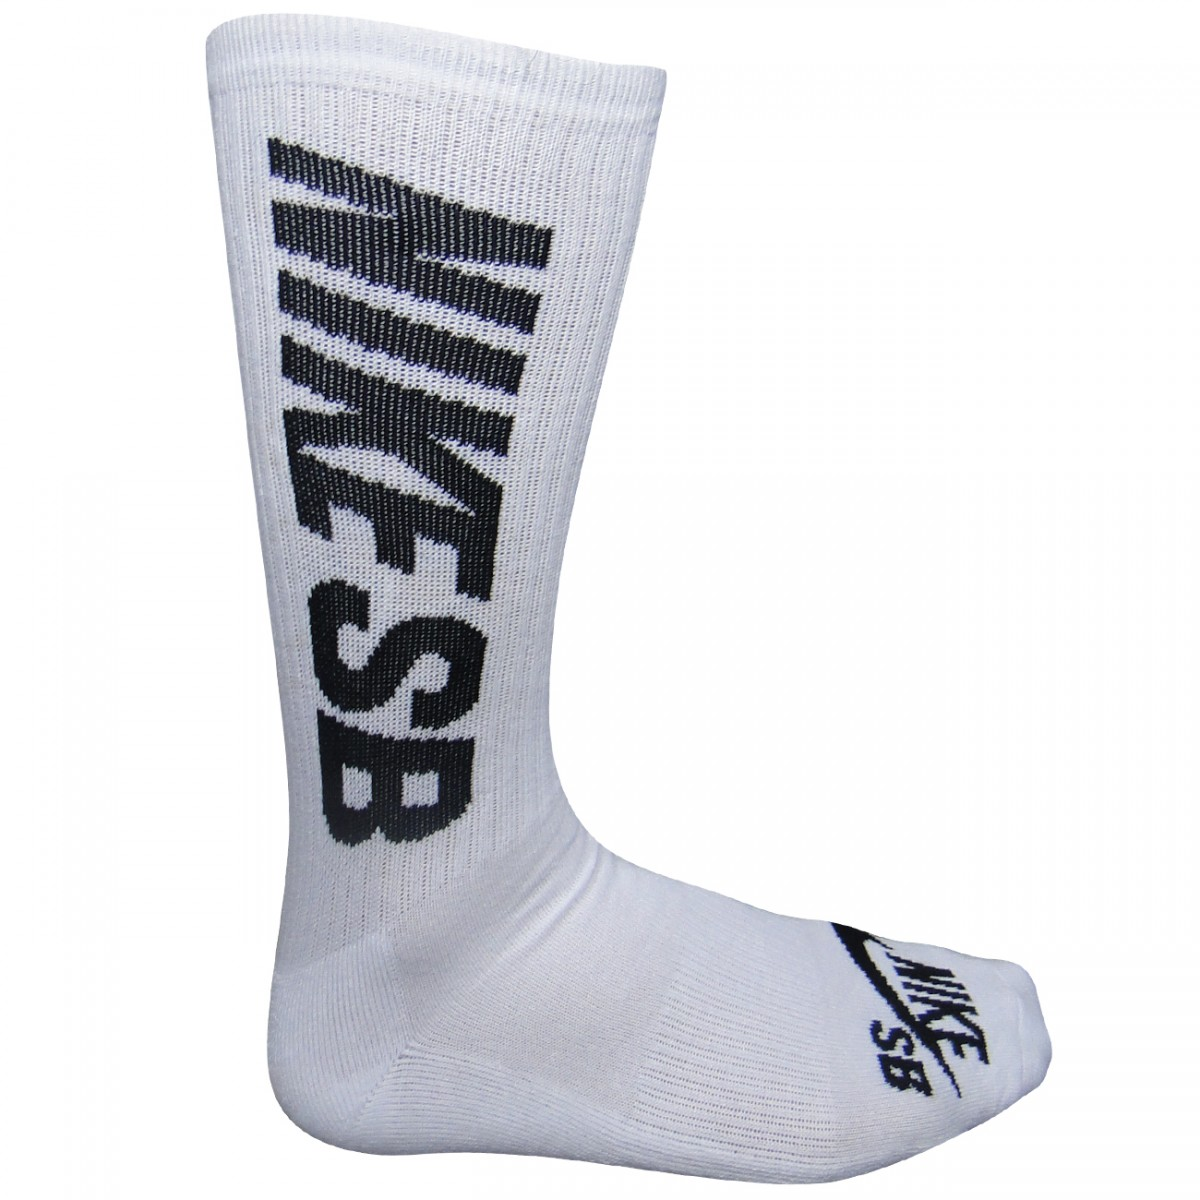 Meia Nike SB Sx 4919 Kit 3 Pares SX4919 101 - Branco Preto ... 0881a0fcf5ce4